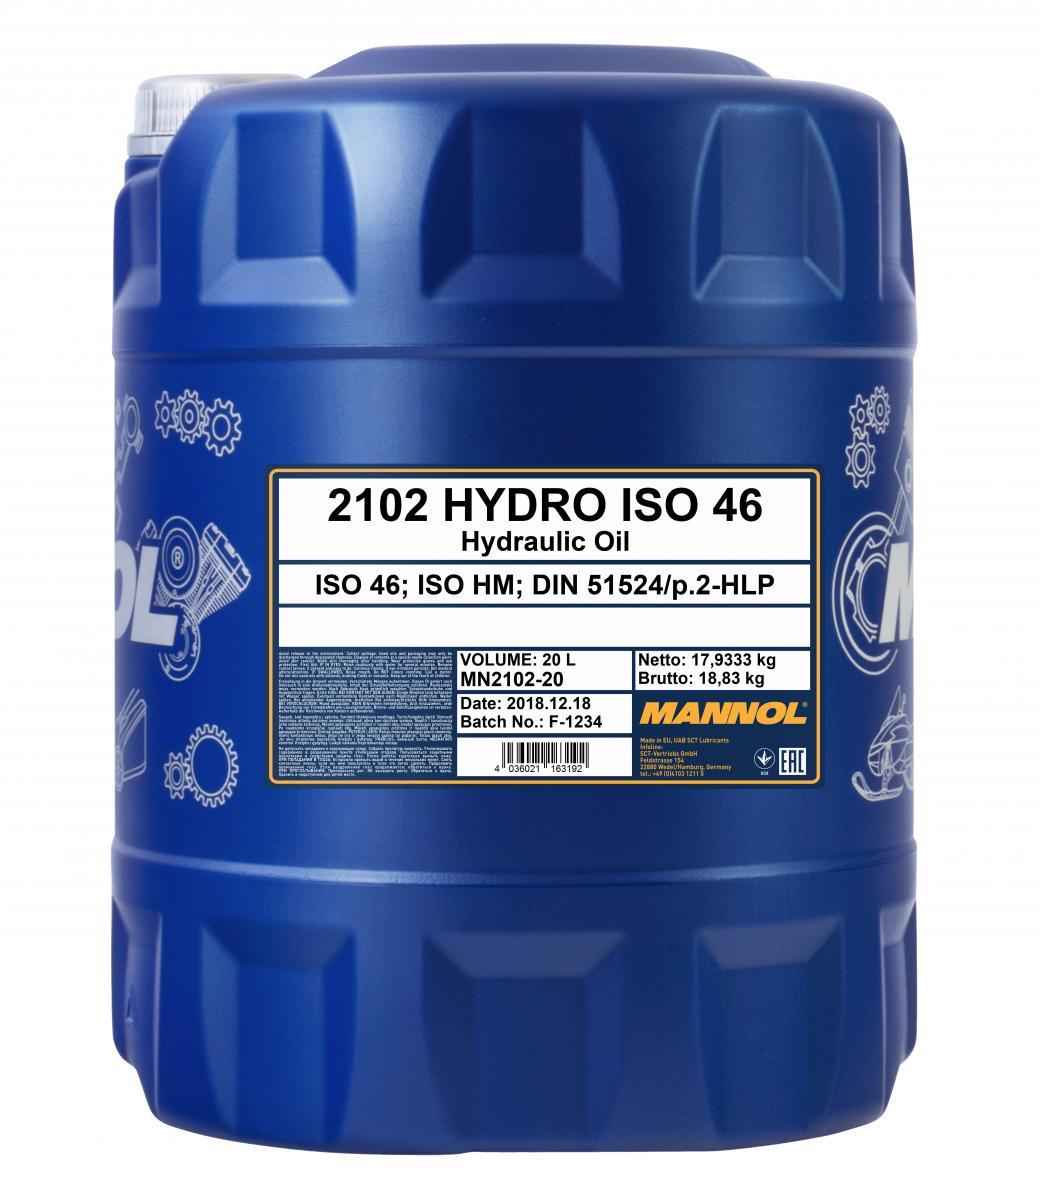 Hydro ISO 46